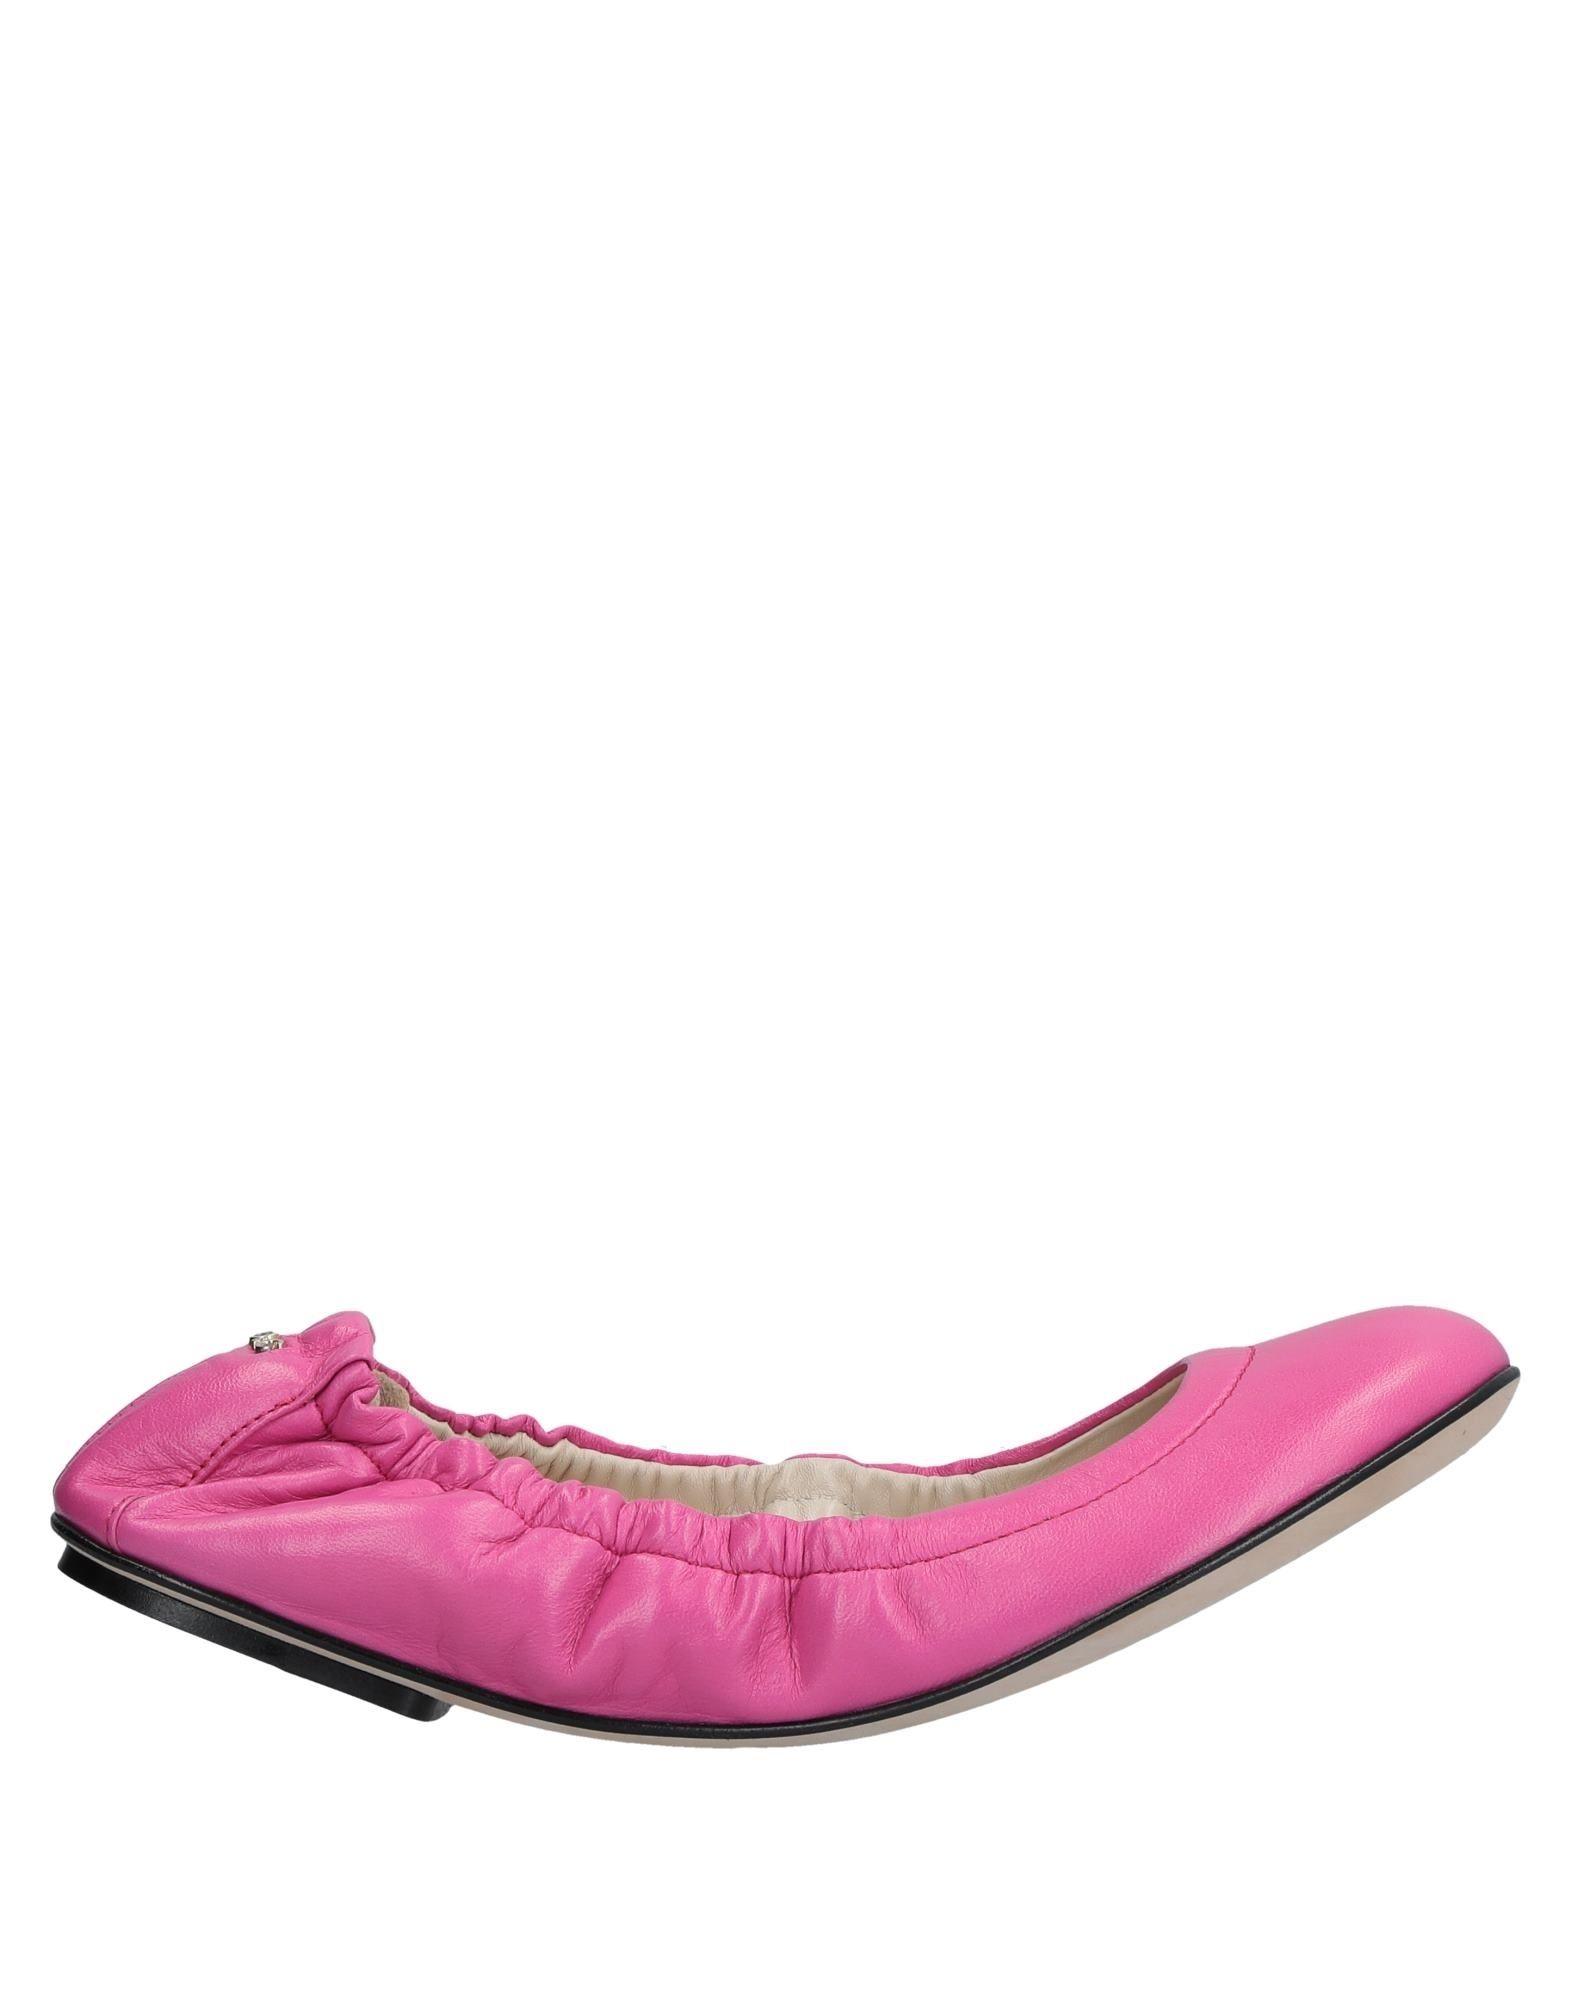 D&G Ballerinas Damen 11541737QRGut aussehende strapazierfähige Schuhe